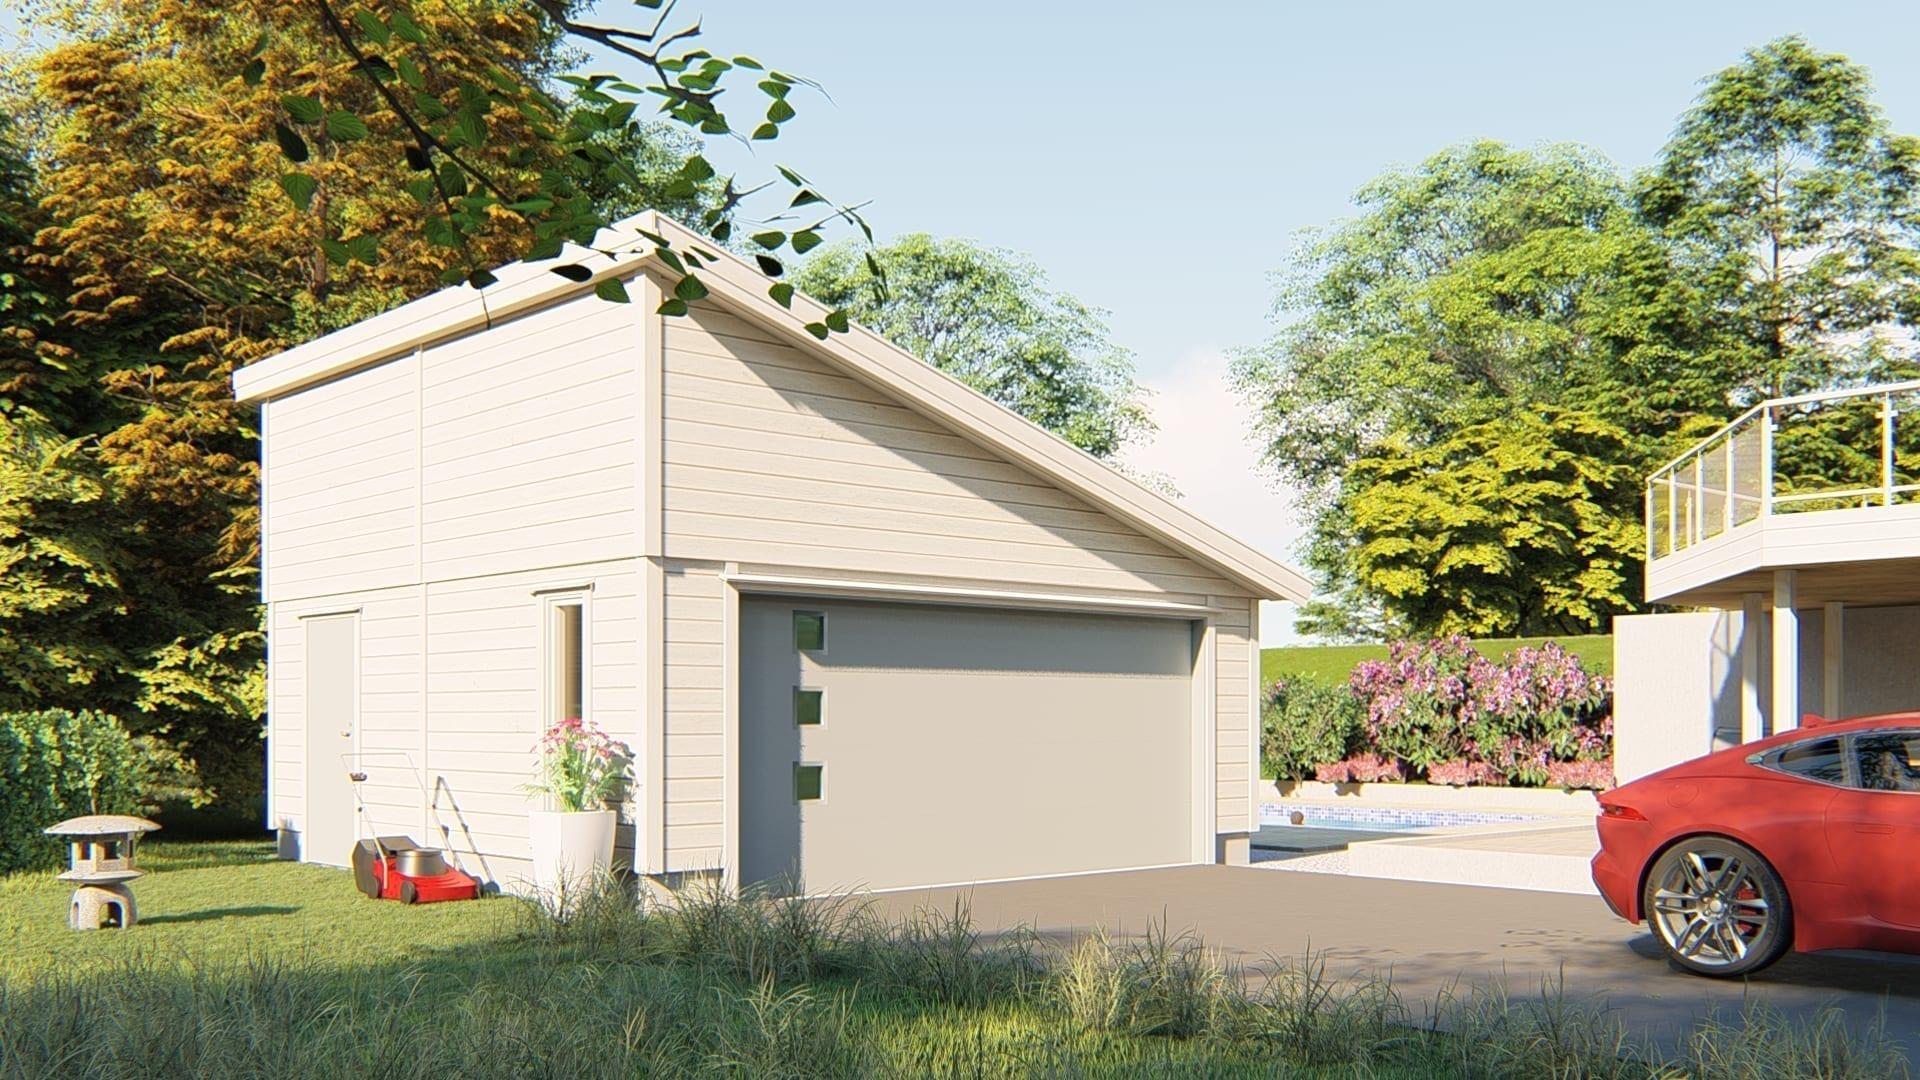 Priser byg selv garage Byg selv